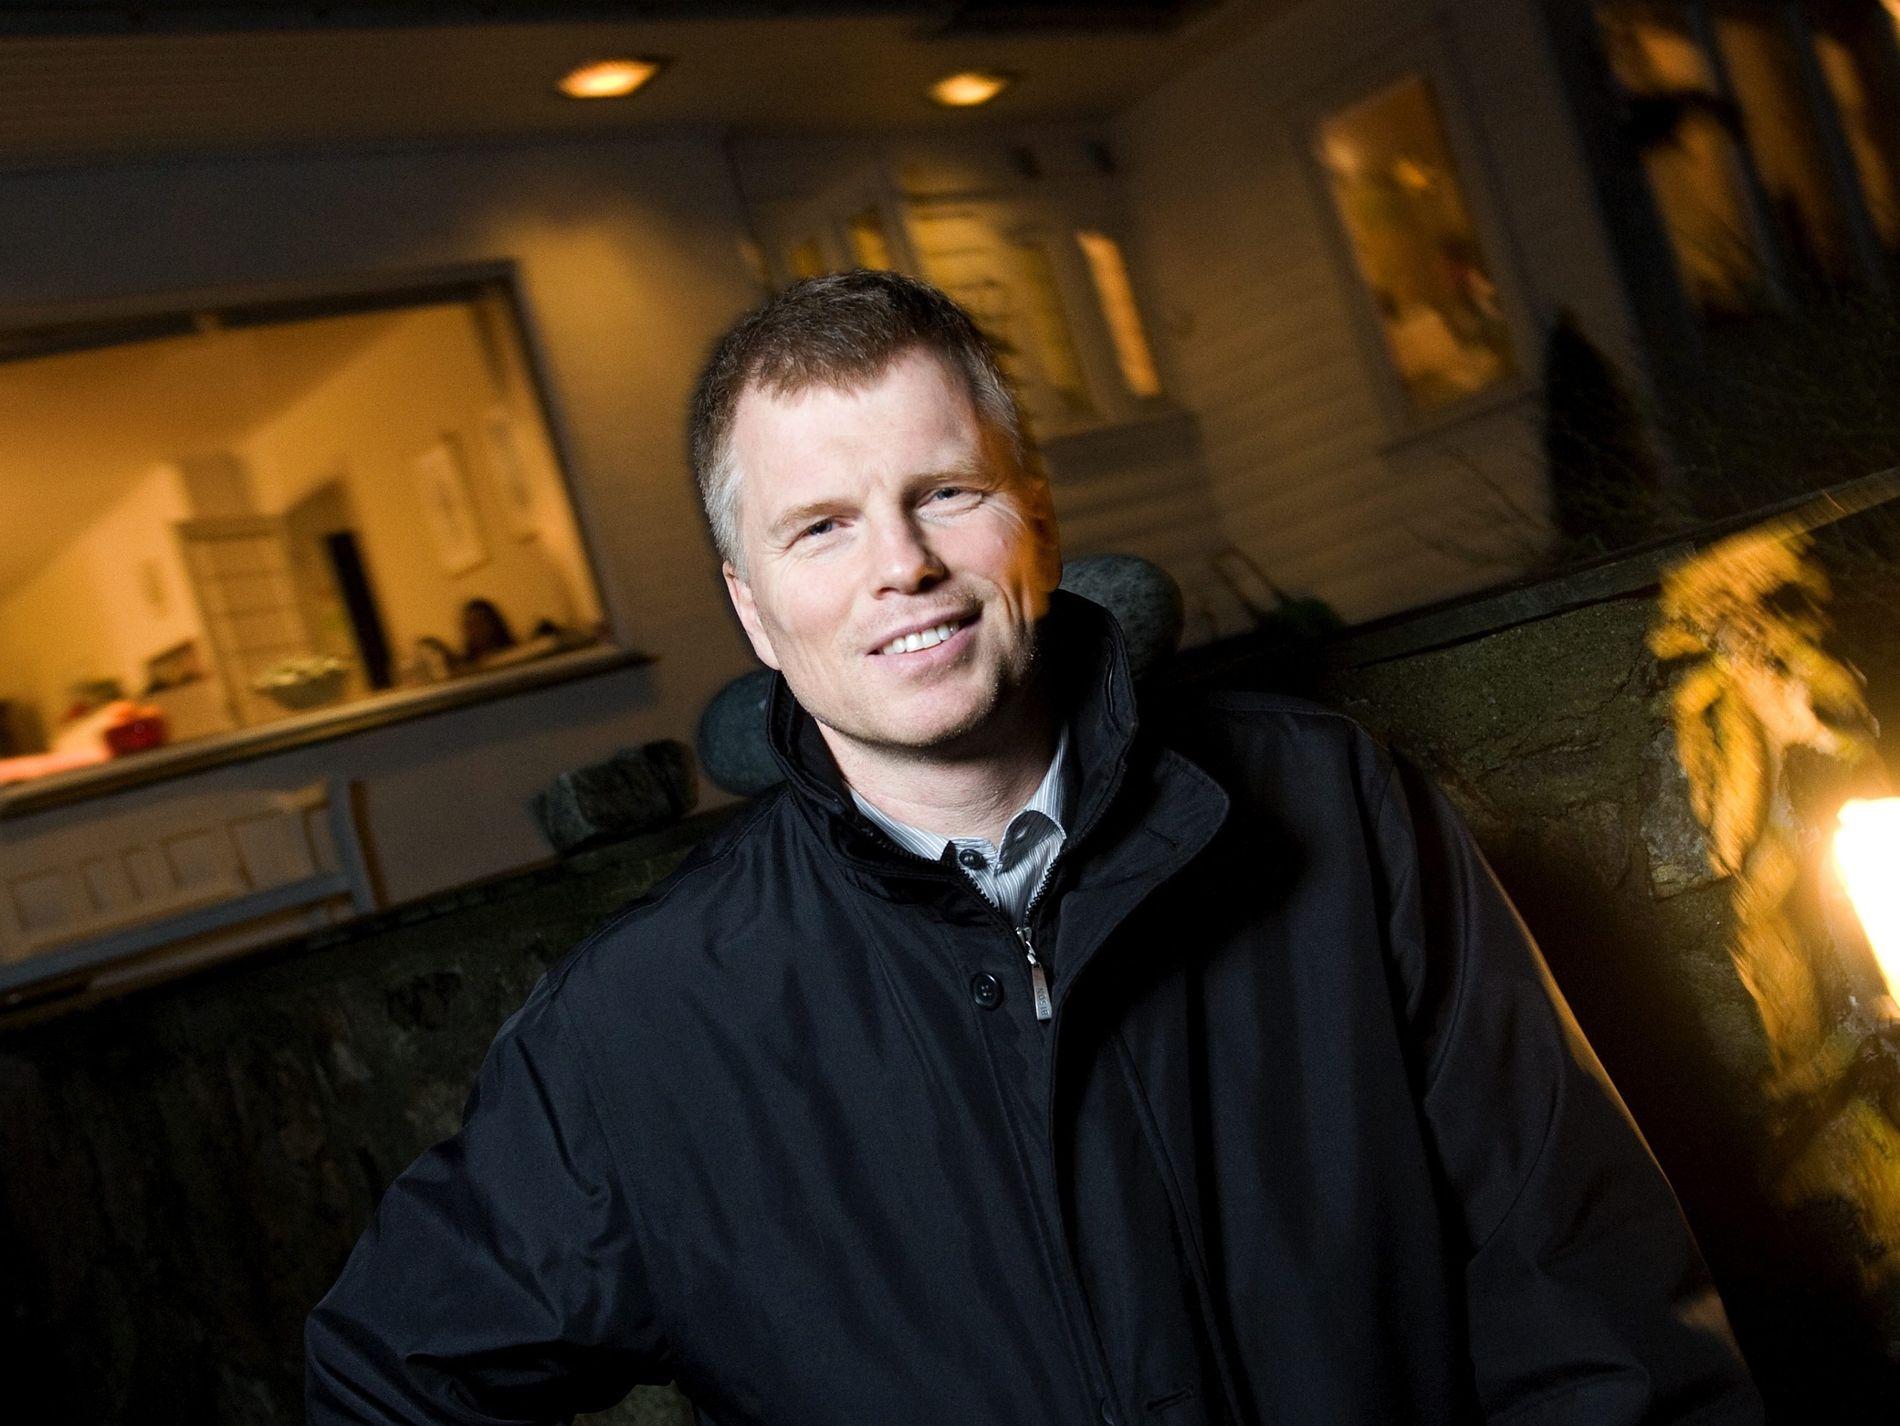 SER VIDERE FALL: NHH-professor Ola H. Grytten tor ikke Norges laveste boliglånspris i historien ennå er nådd.